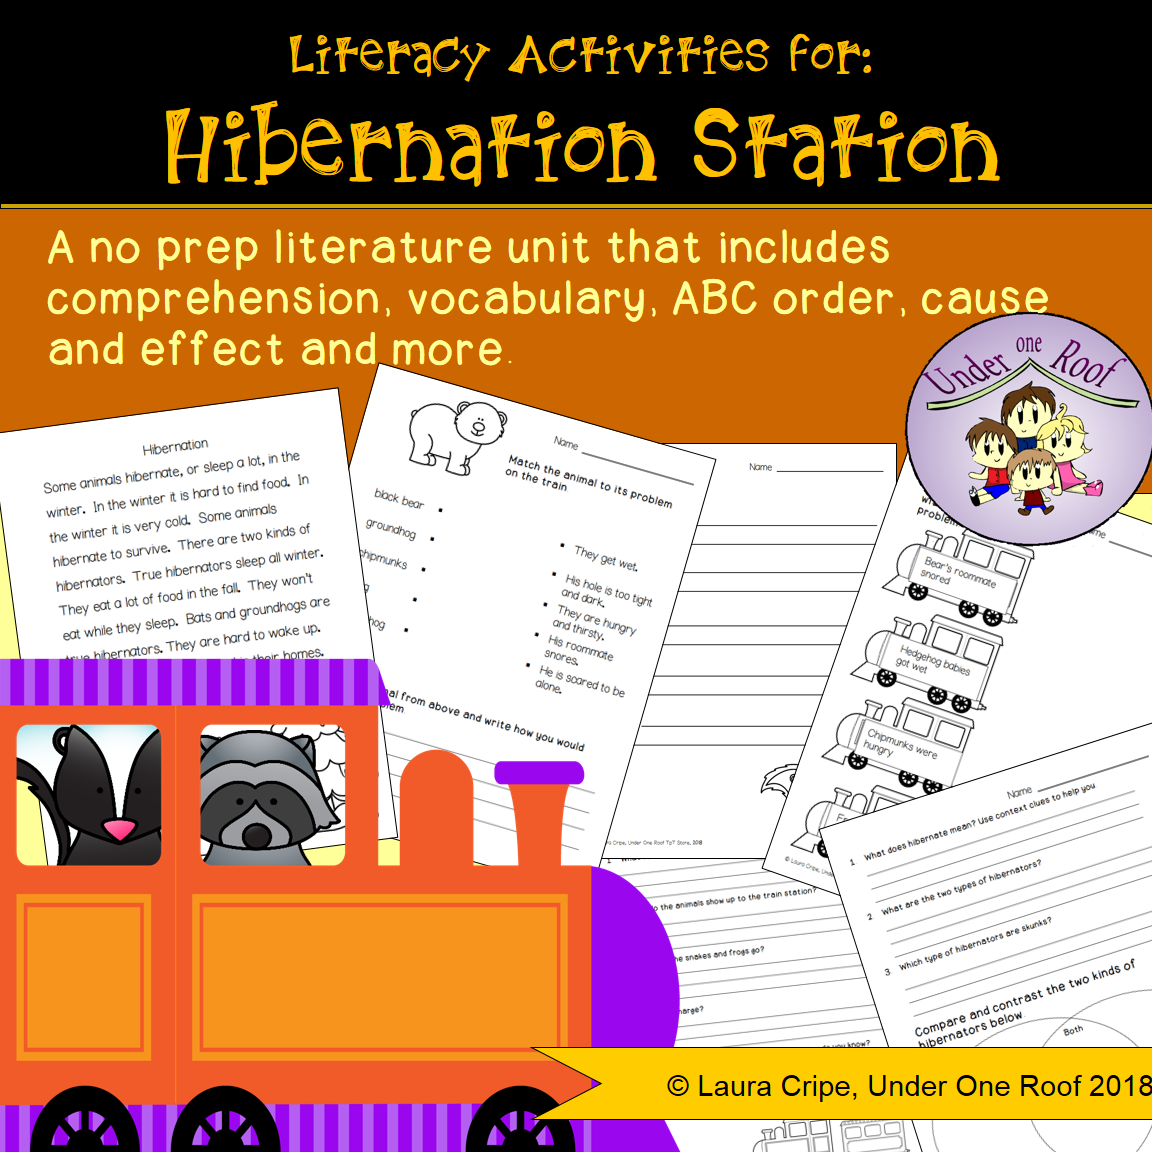 Hibernation Station A Literature Unit